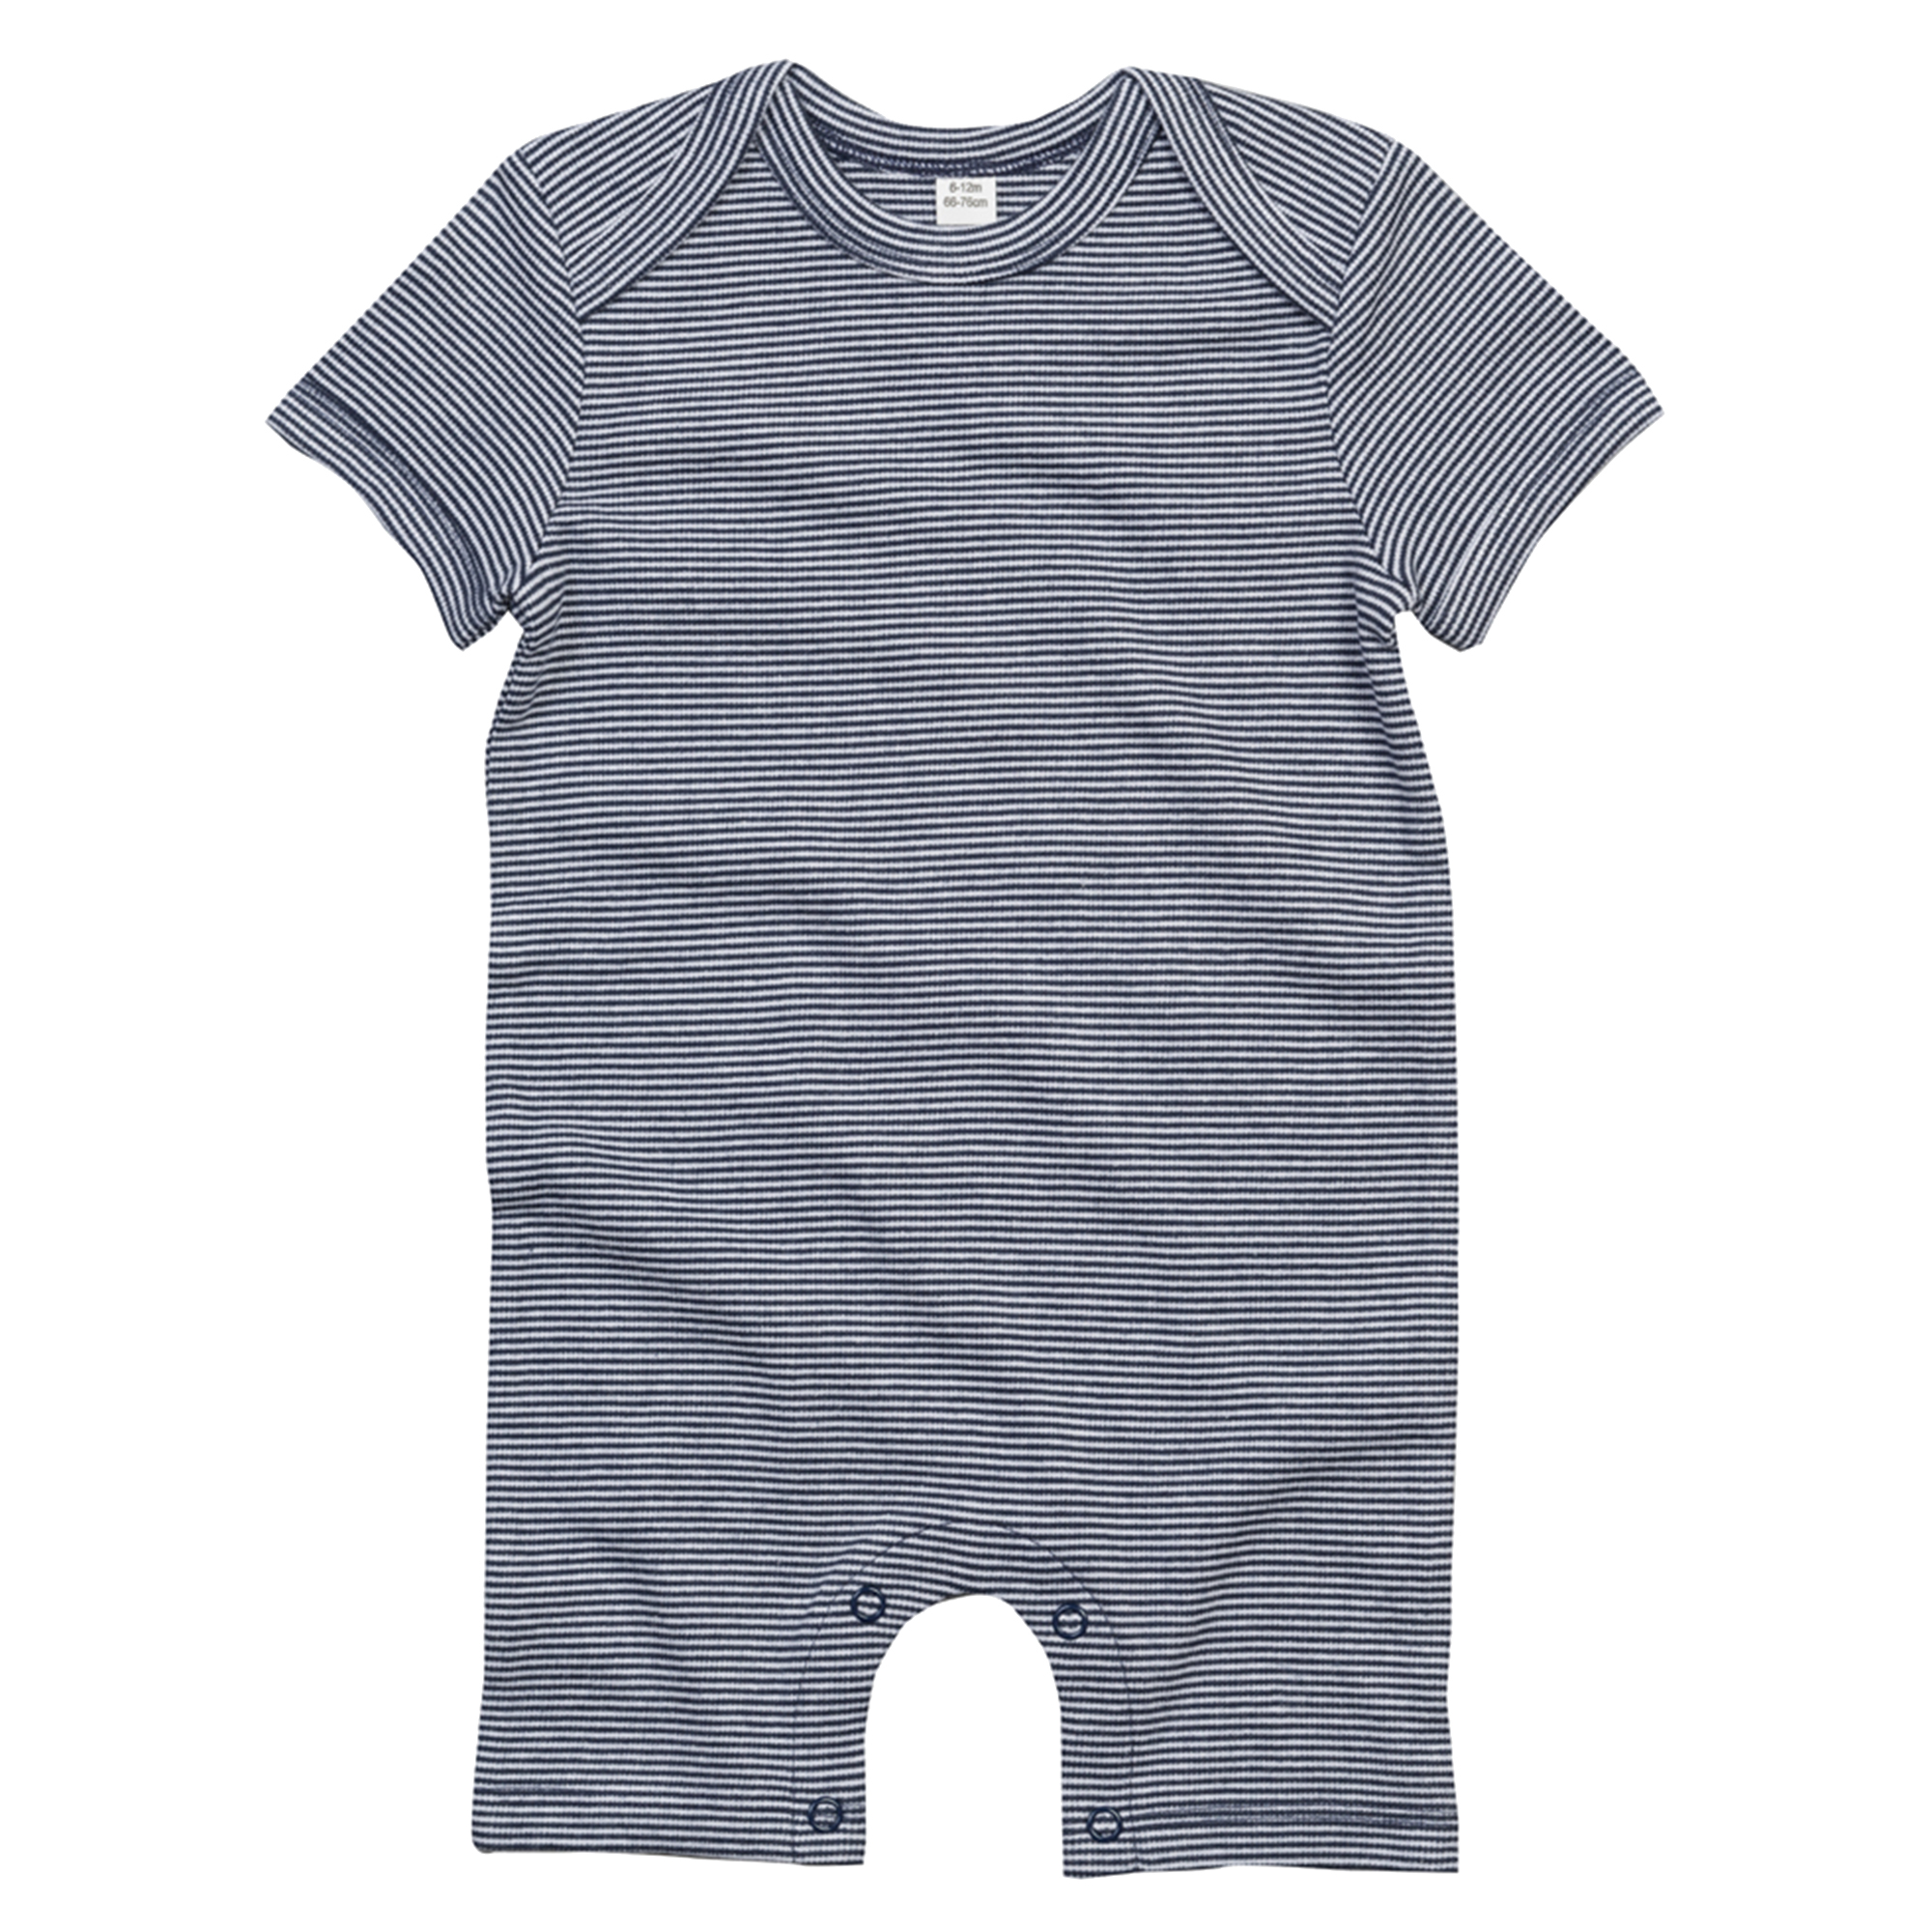 BabyBugz-Body-corto-a-rayas-para-bebes-PC3147